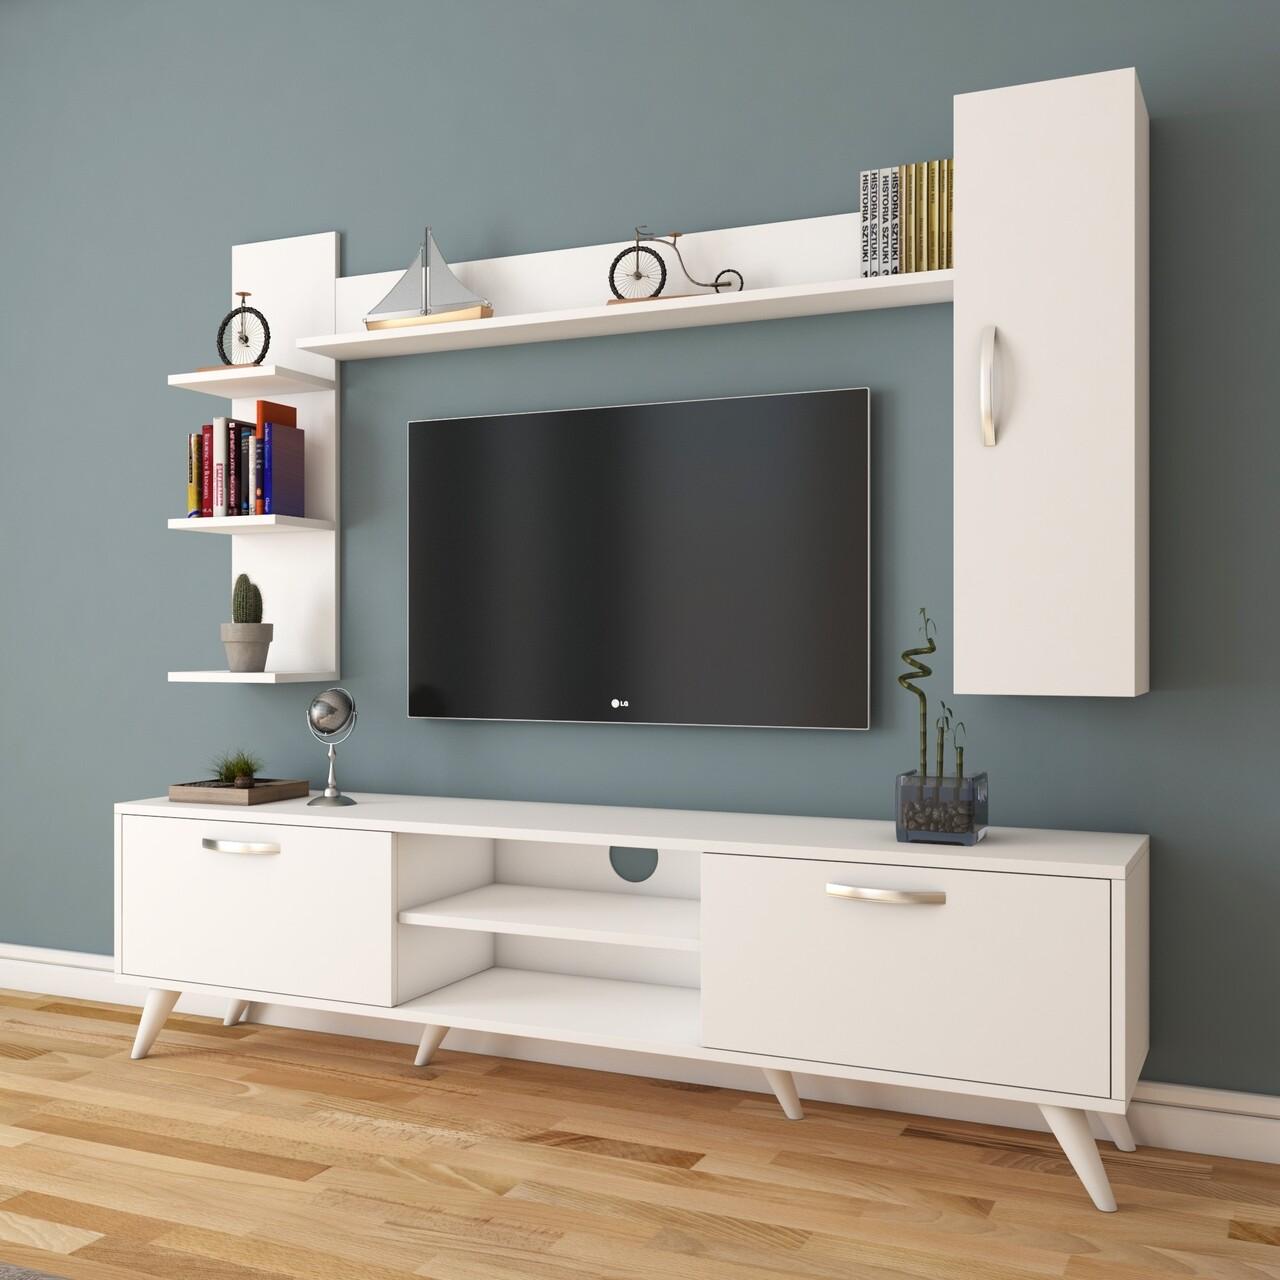 Comoda TV cu 2 rafturi de perete si cabinet M20 - 269, Wren, 180 x 35 x 48.6 cm/90 cm/133 cm, white